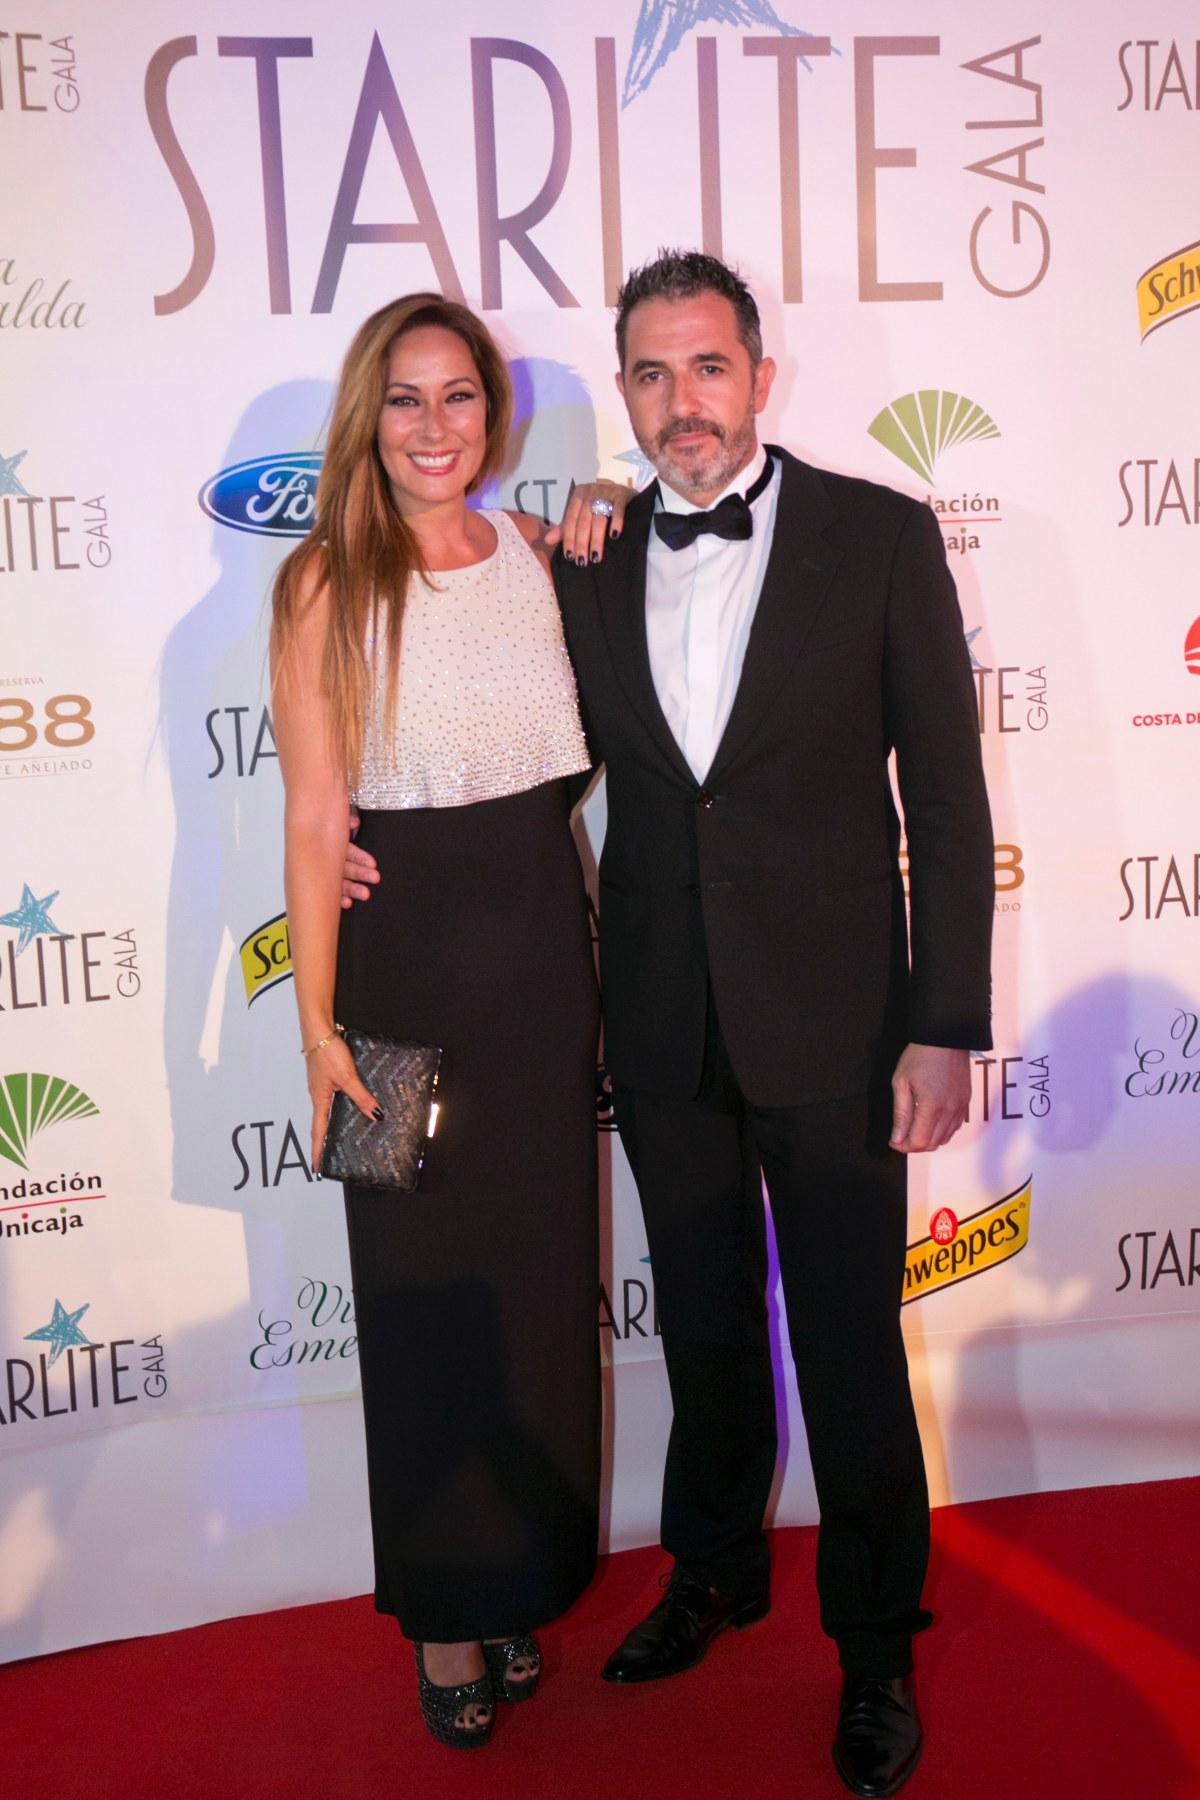 gala Starlite 2018